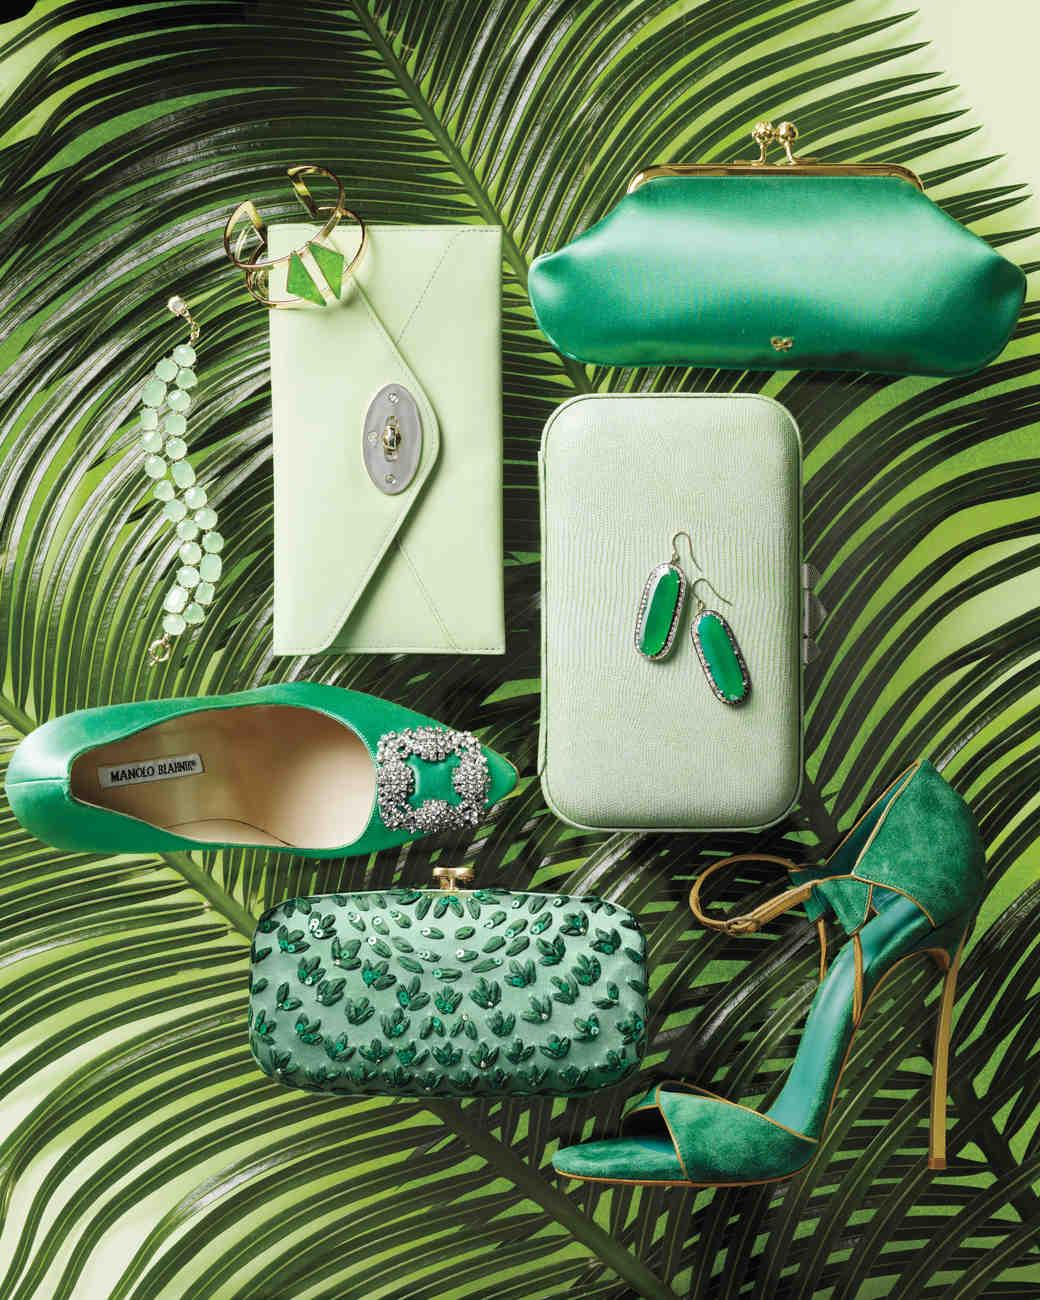 accessories-a-876-focus-mwd109950.jpg